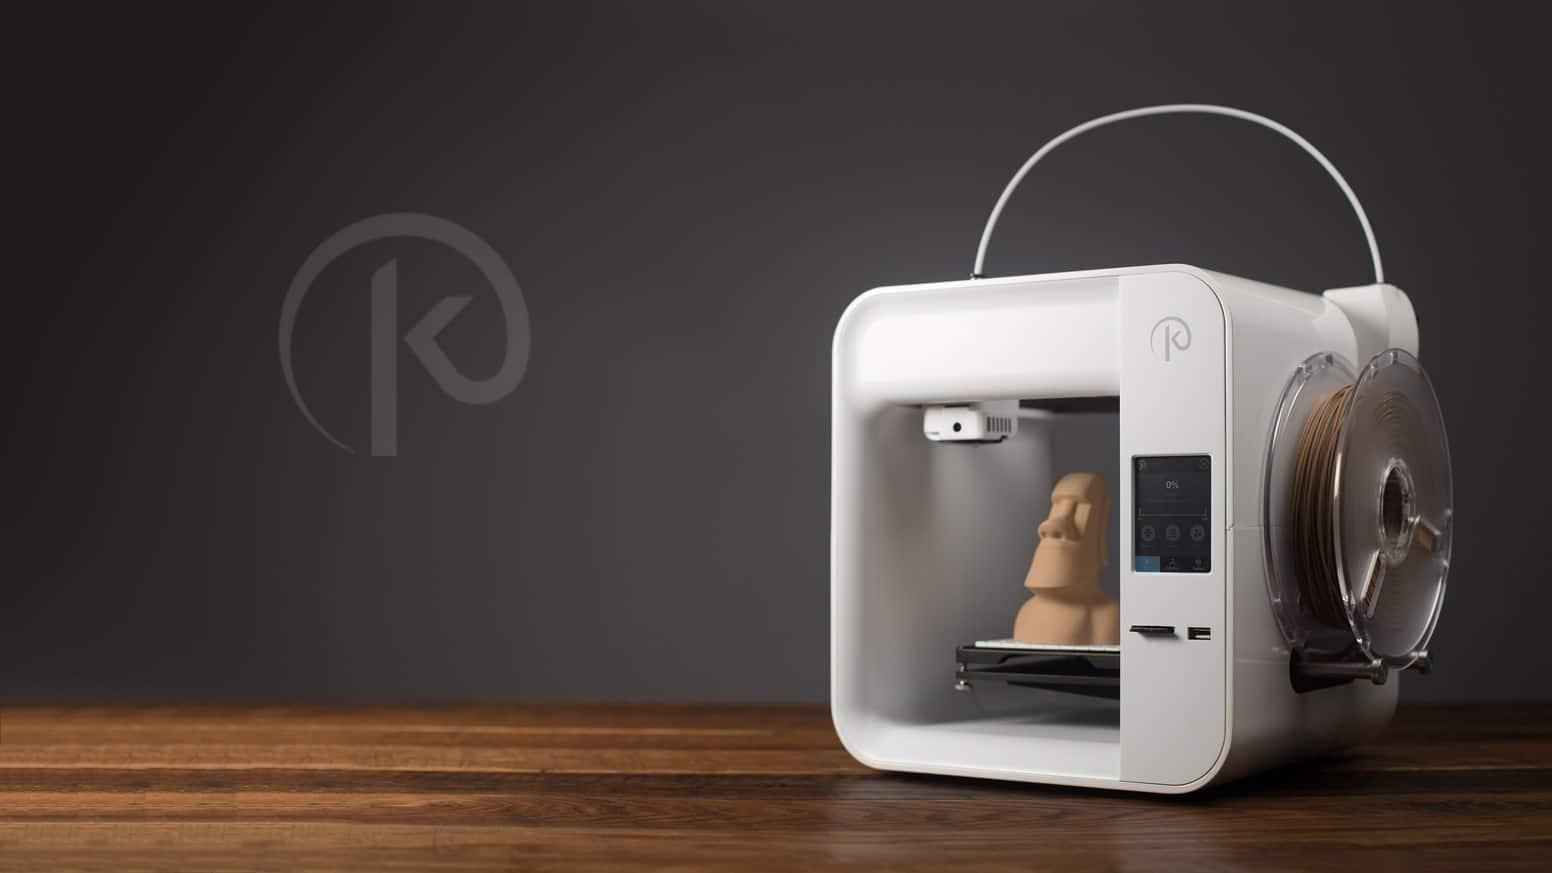 impresora 3D hackeada